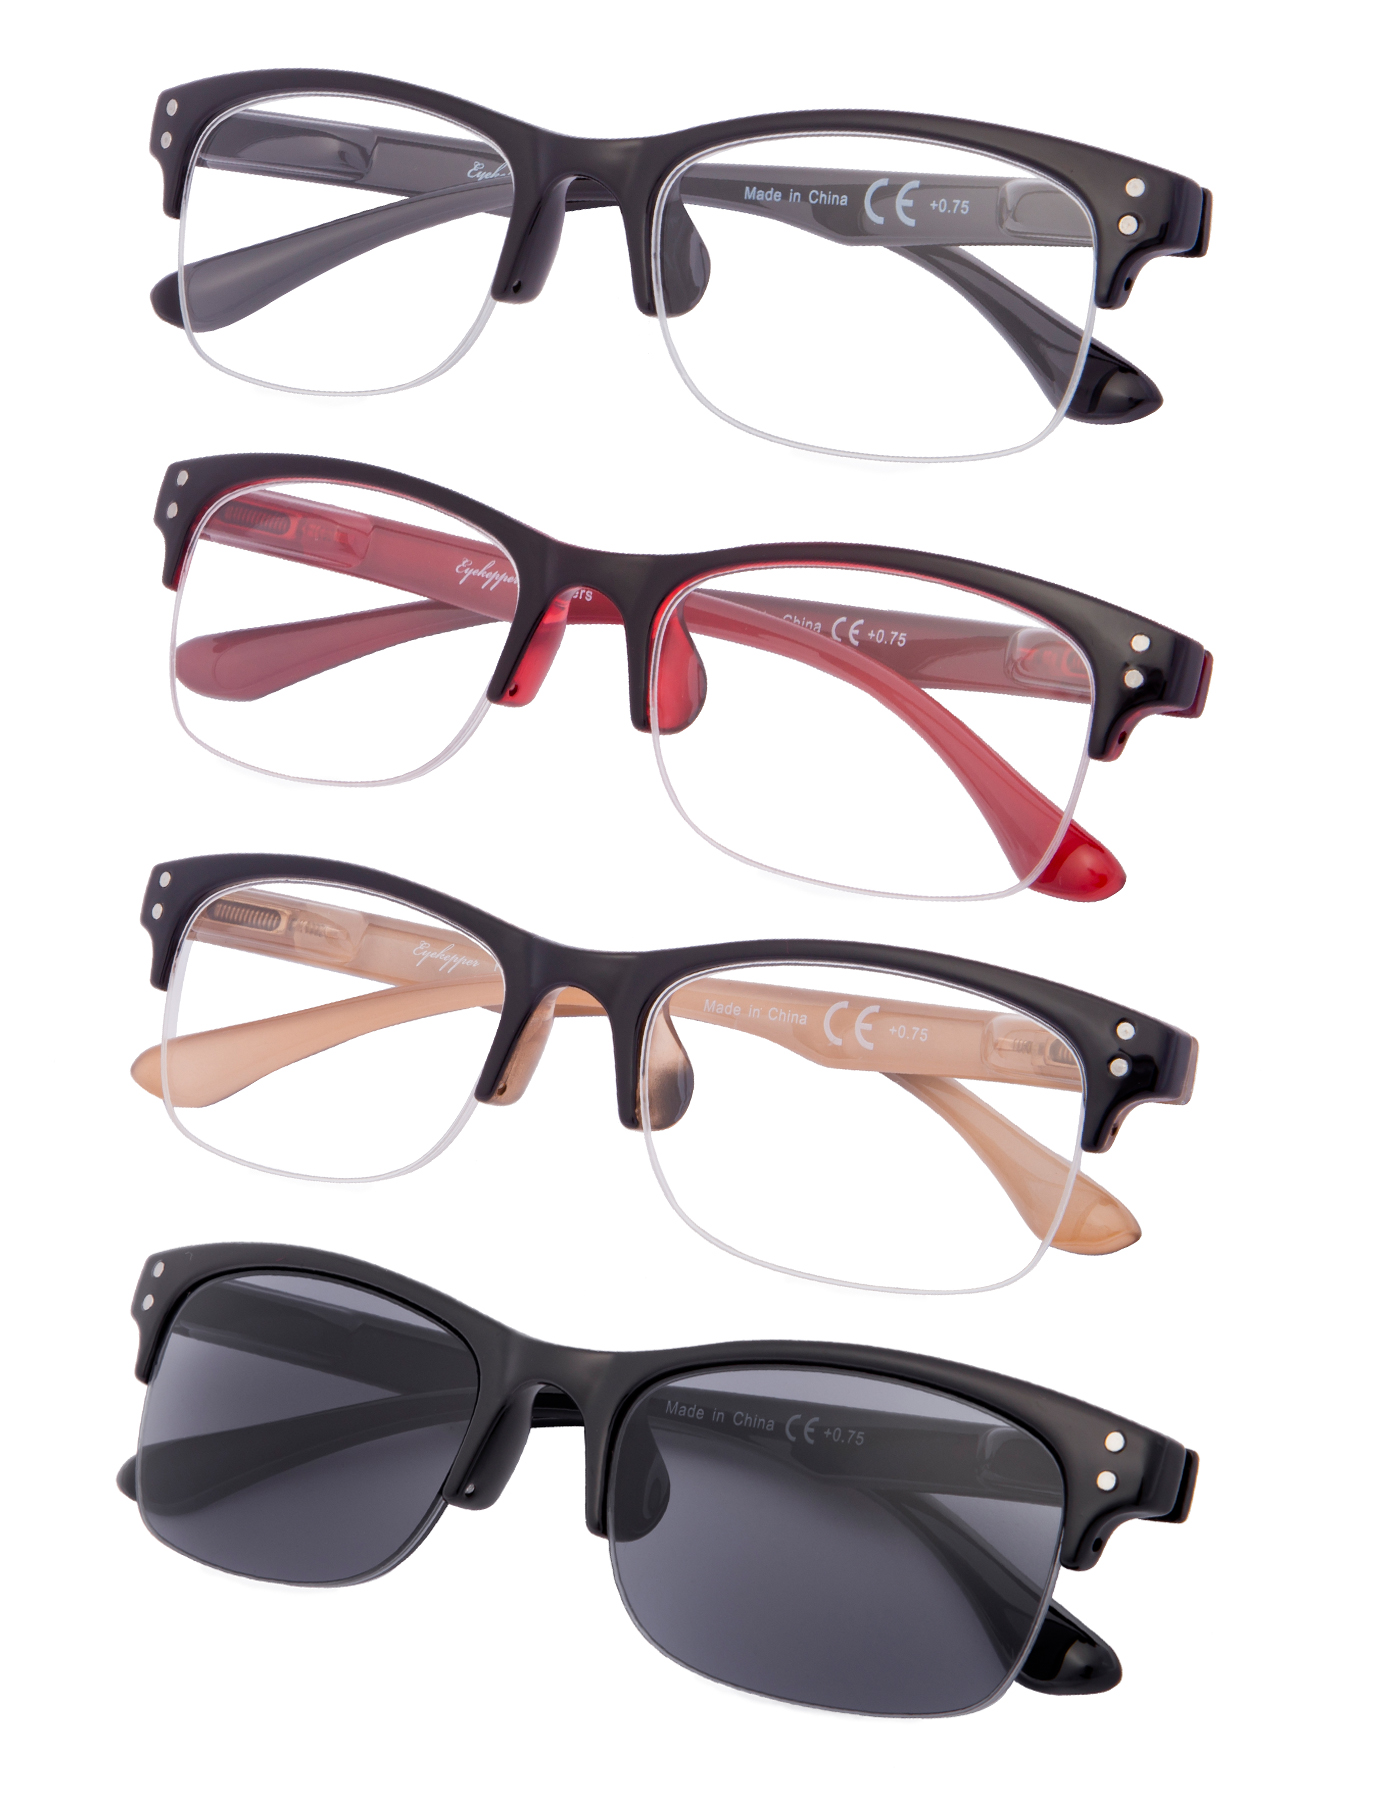 2c070629d7f5 Eyekepper Reading Glasses 4-pack Stylish Half-rim Design with Quality Spring  Hinges Readers R088-4pcs-Mix